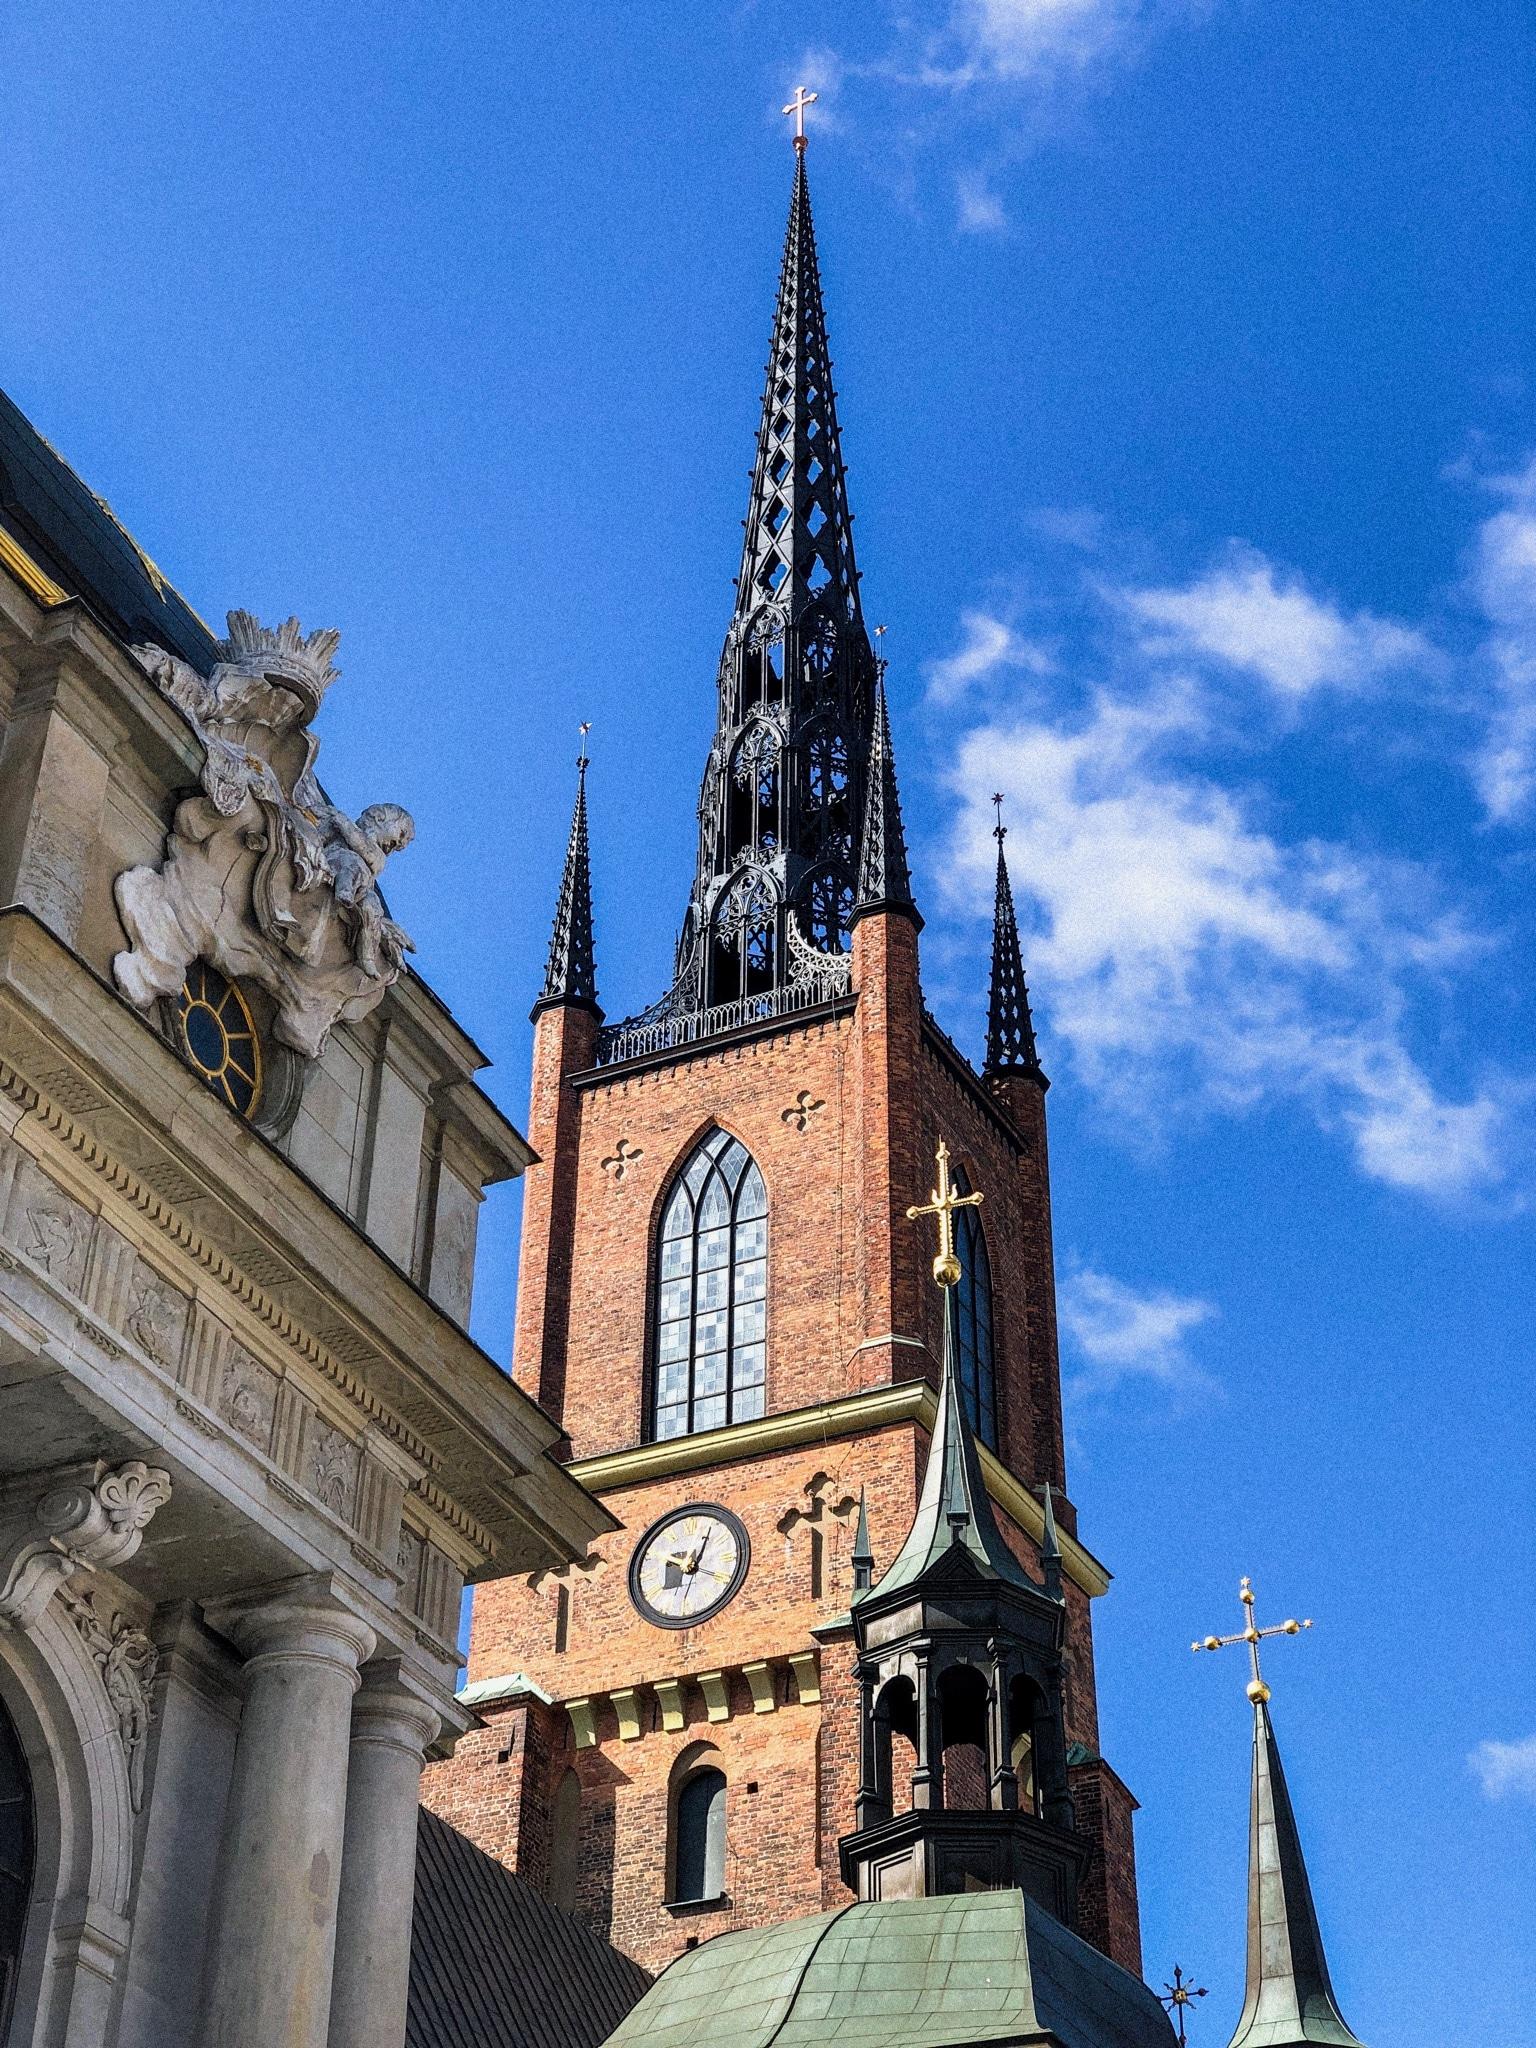 Stockholm - Riddarholmen - Riddarholmskyrkan